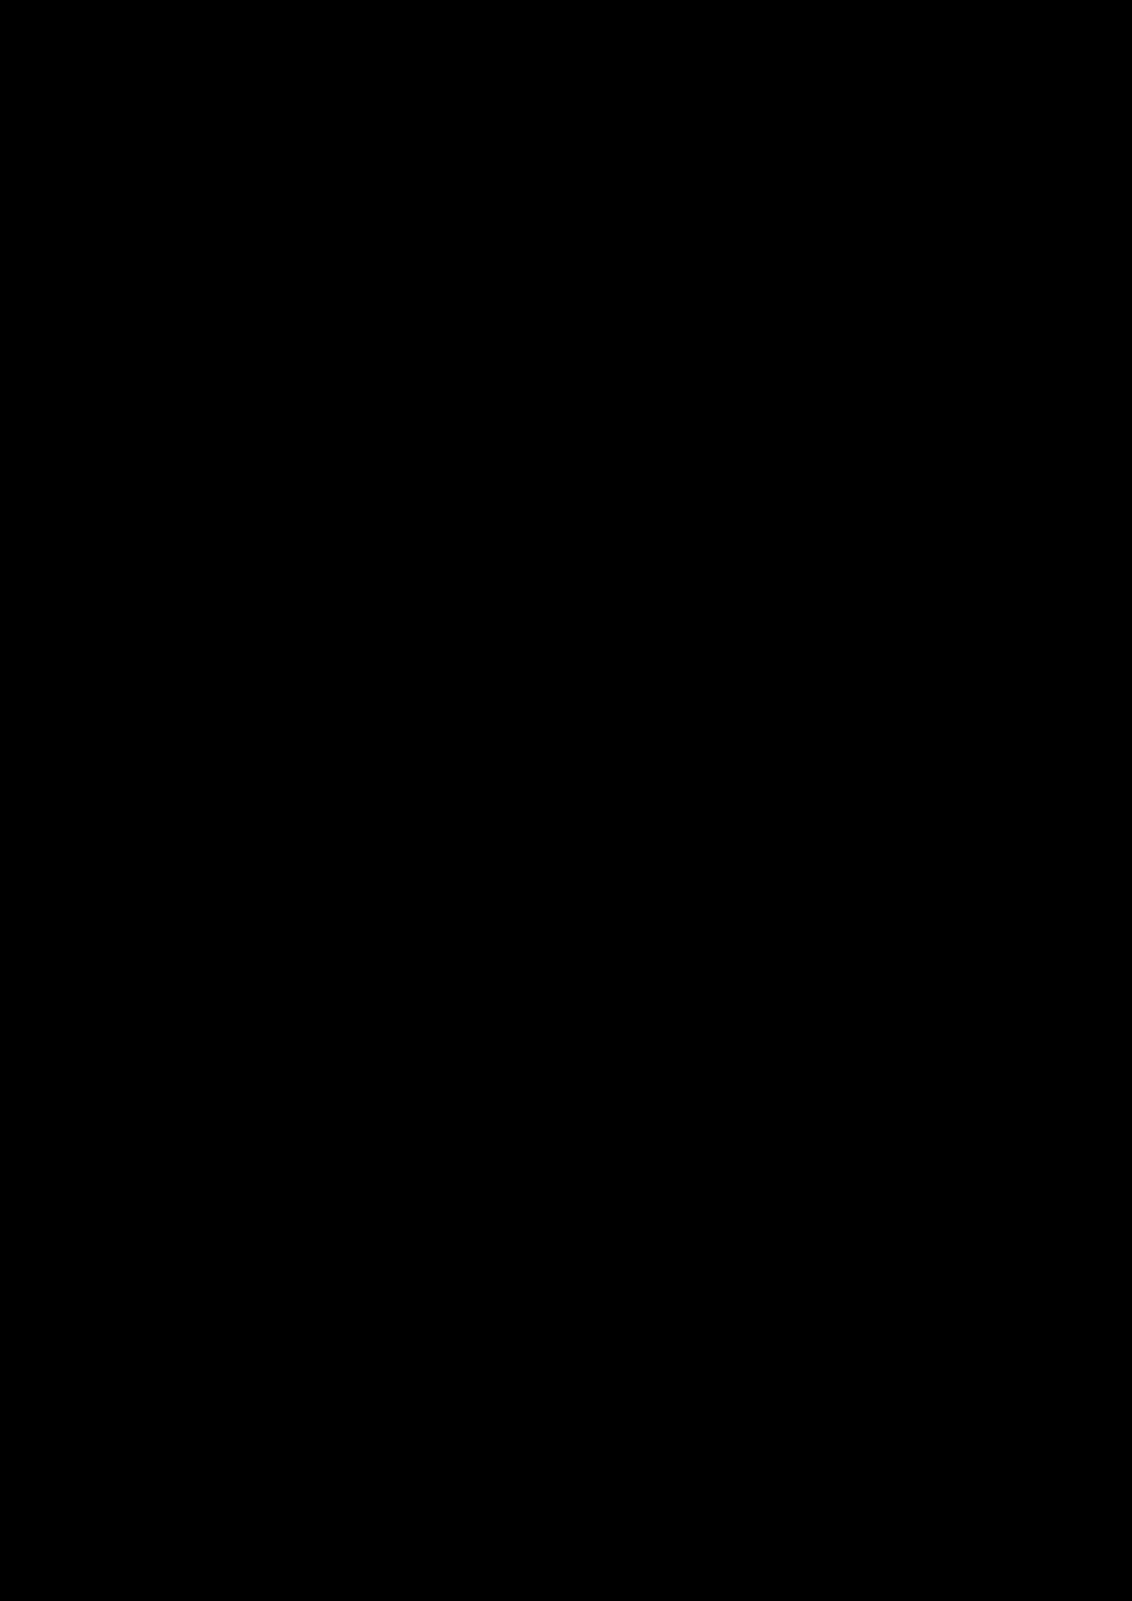 Ispoved Pervogo Boga slide, Image 74